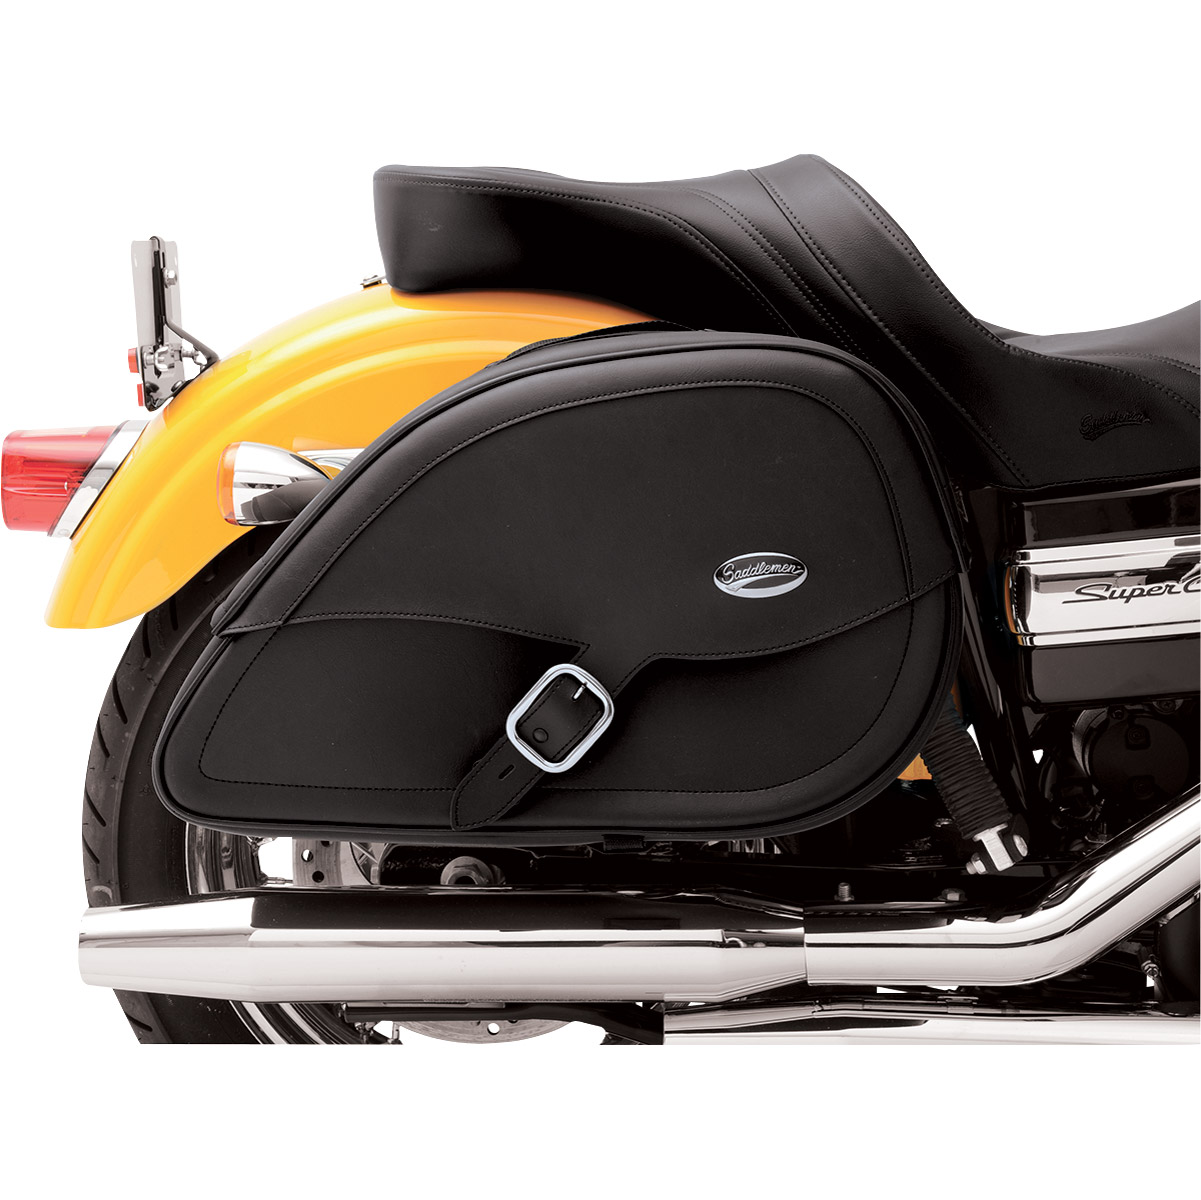 Saddlemen Drifter Rigid-Mount Teardrop Saddlebags for H-D Motorcycles